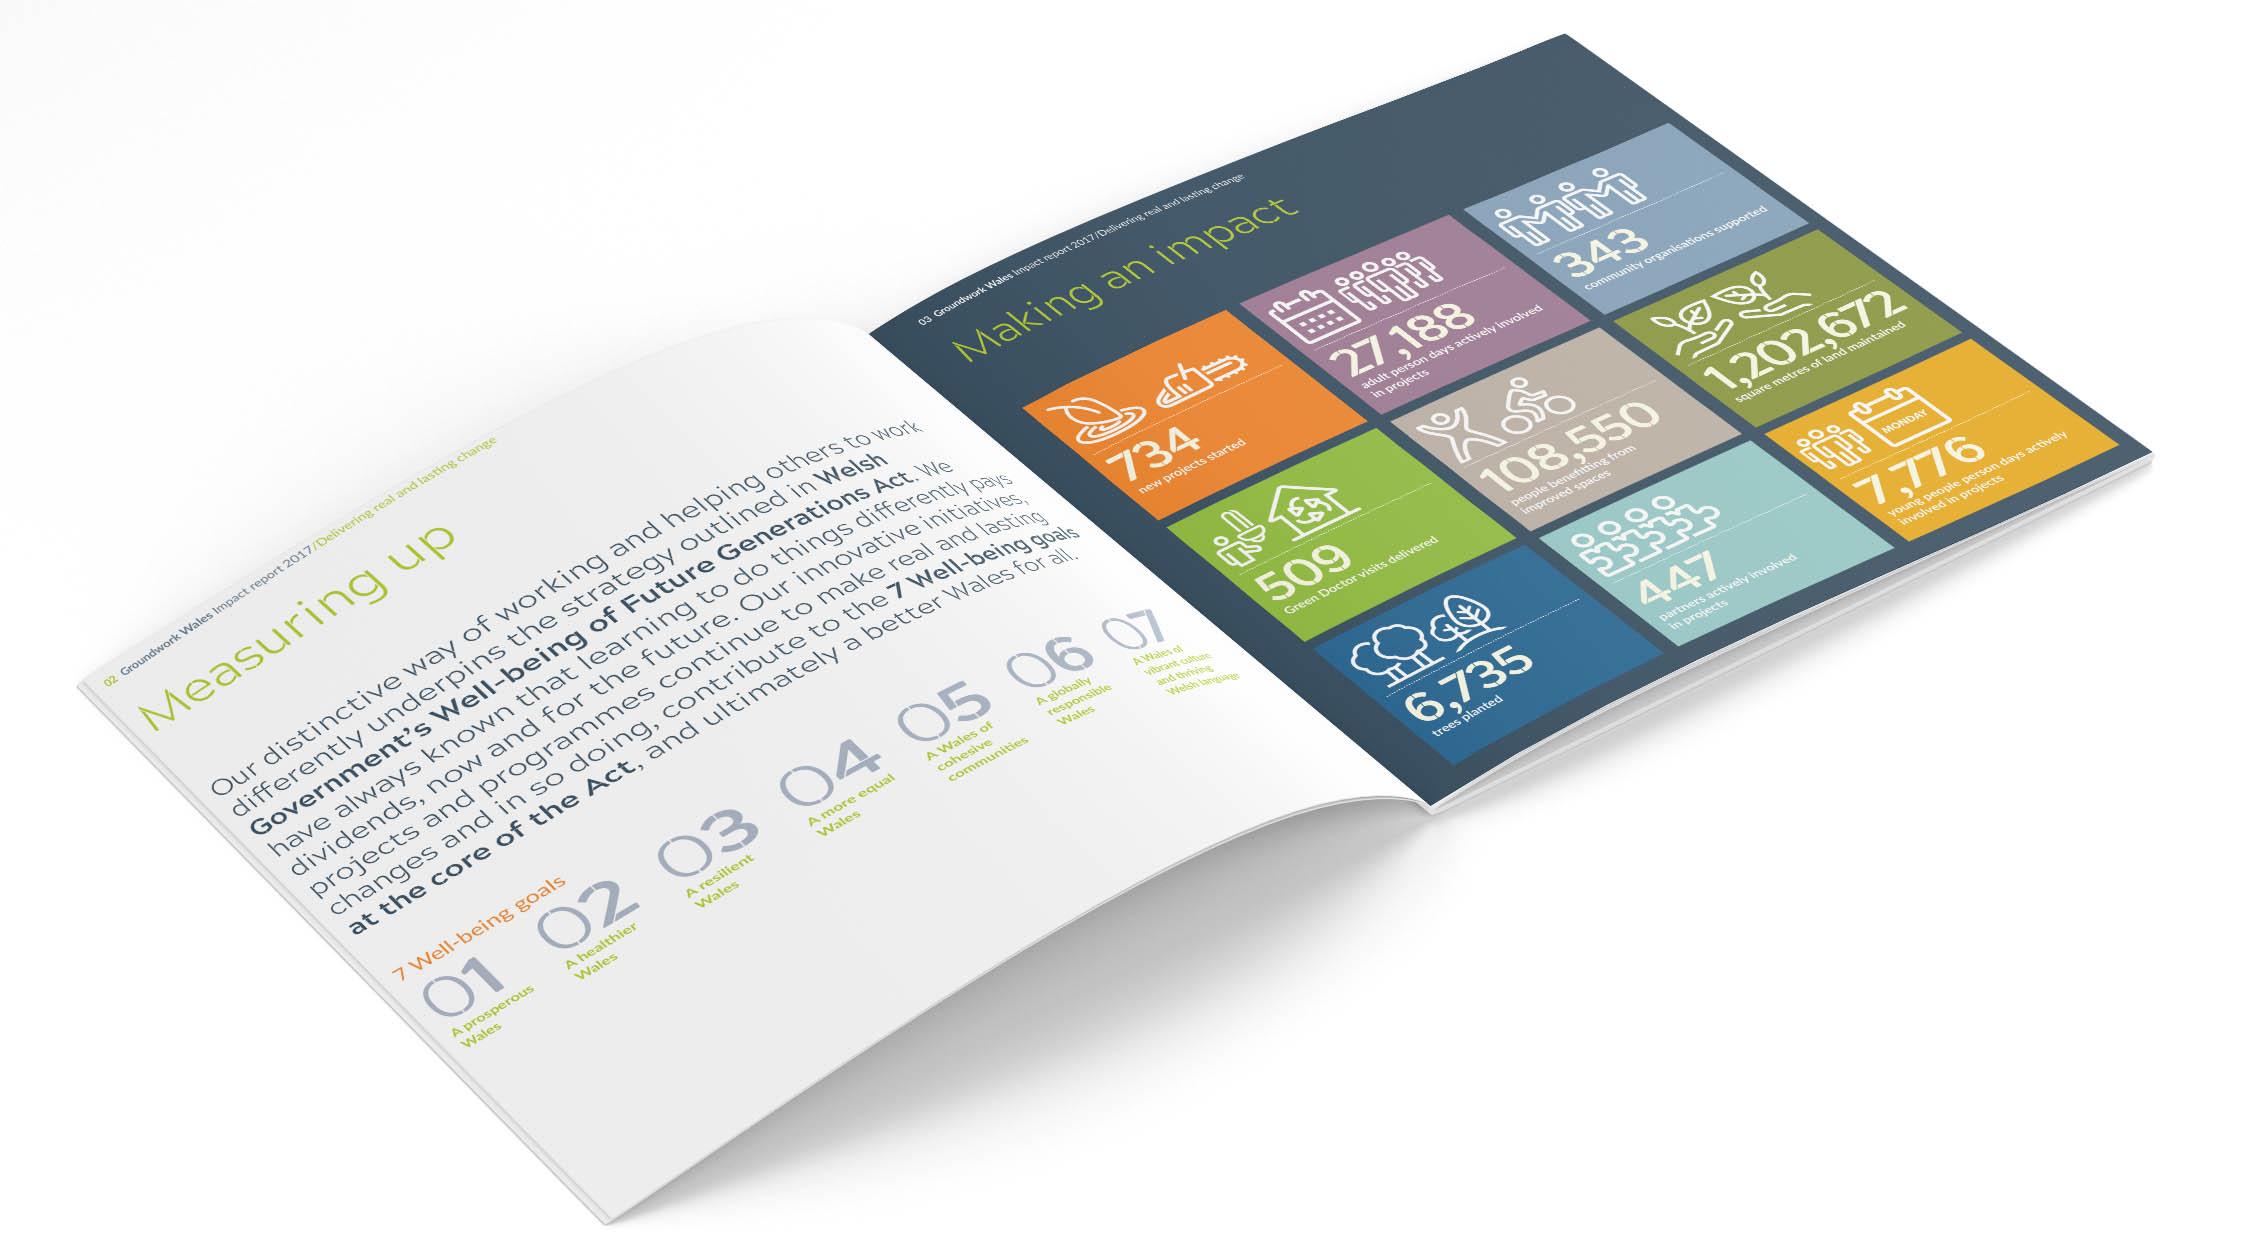 groundwork-wales-impact-report-spread.jpg